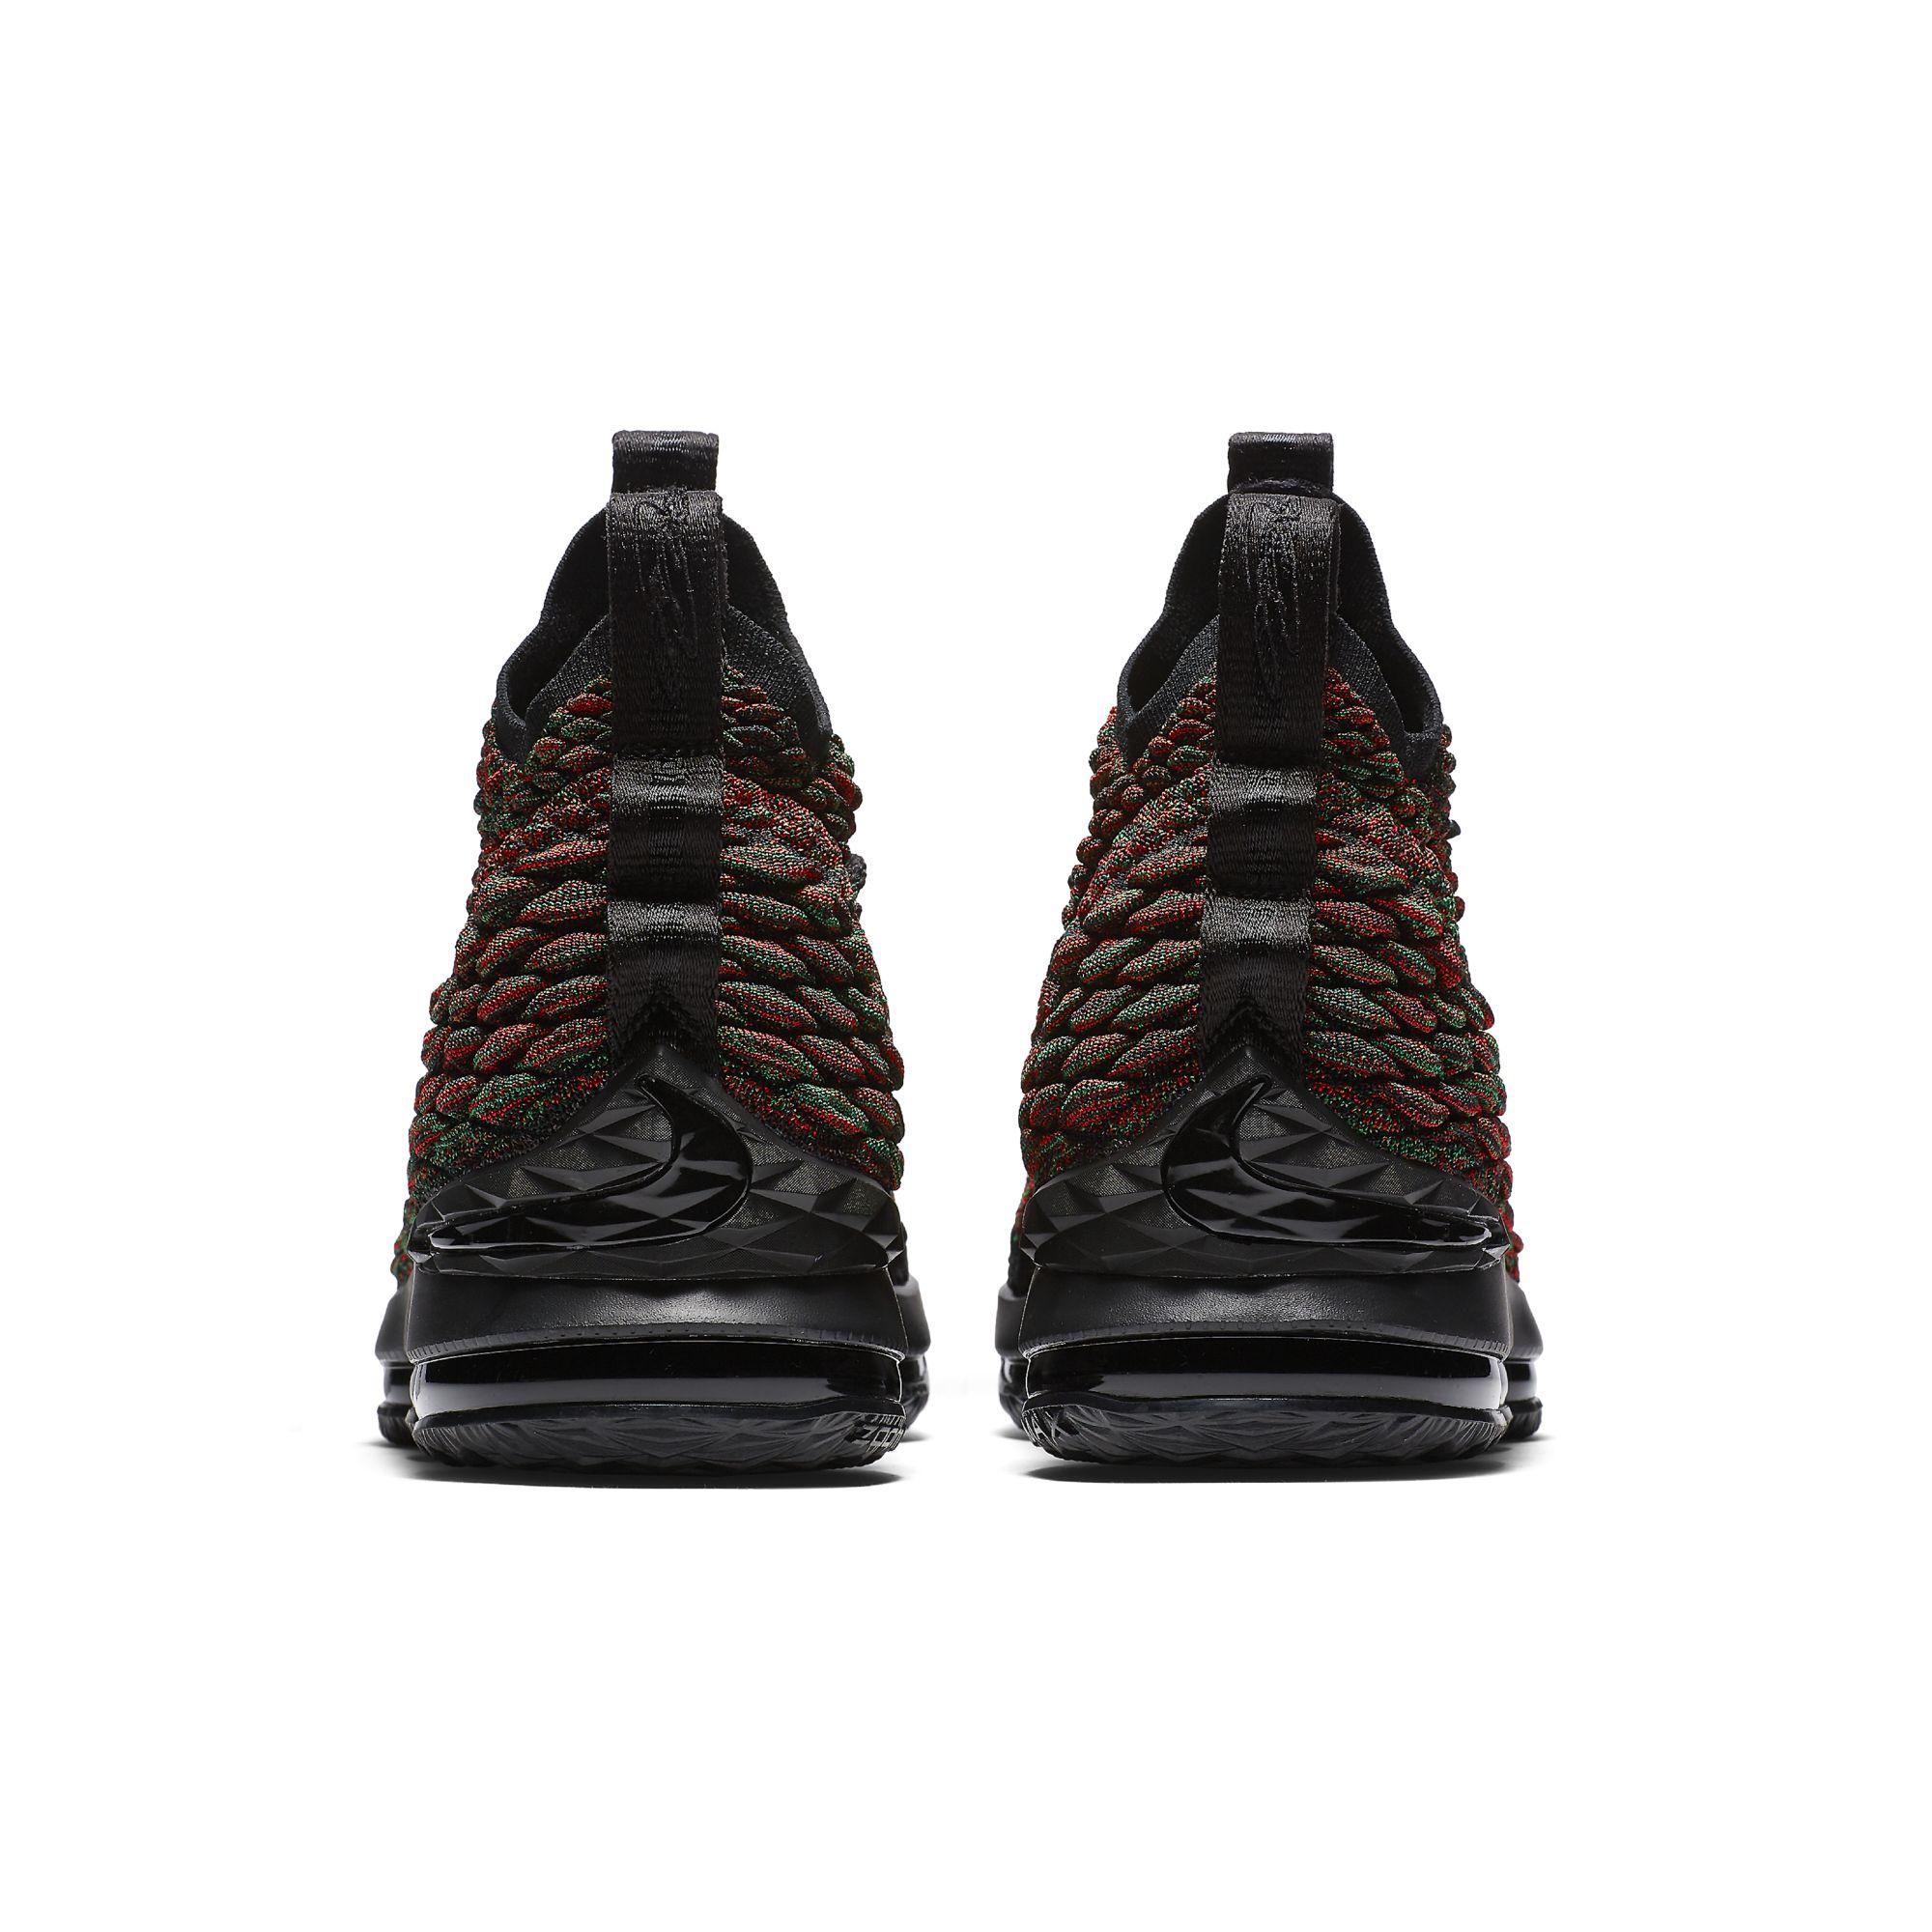 92cba8b797b Nike-Lebron-15-bhm-3 - WearTesters